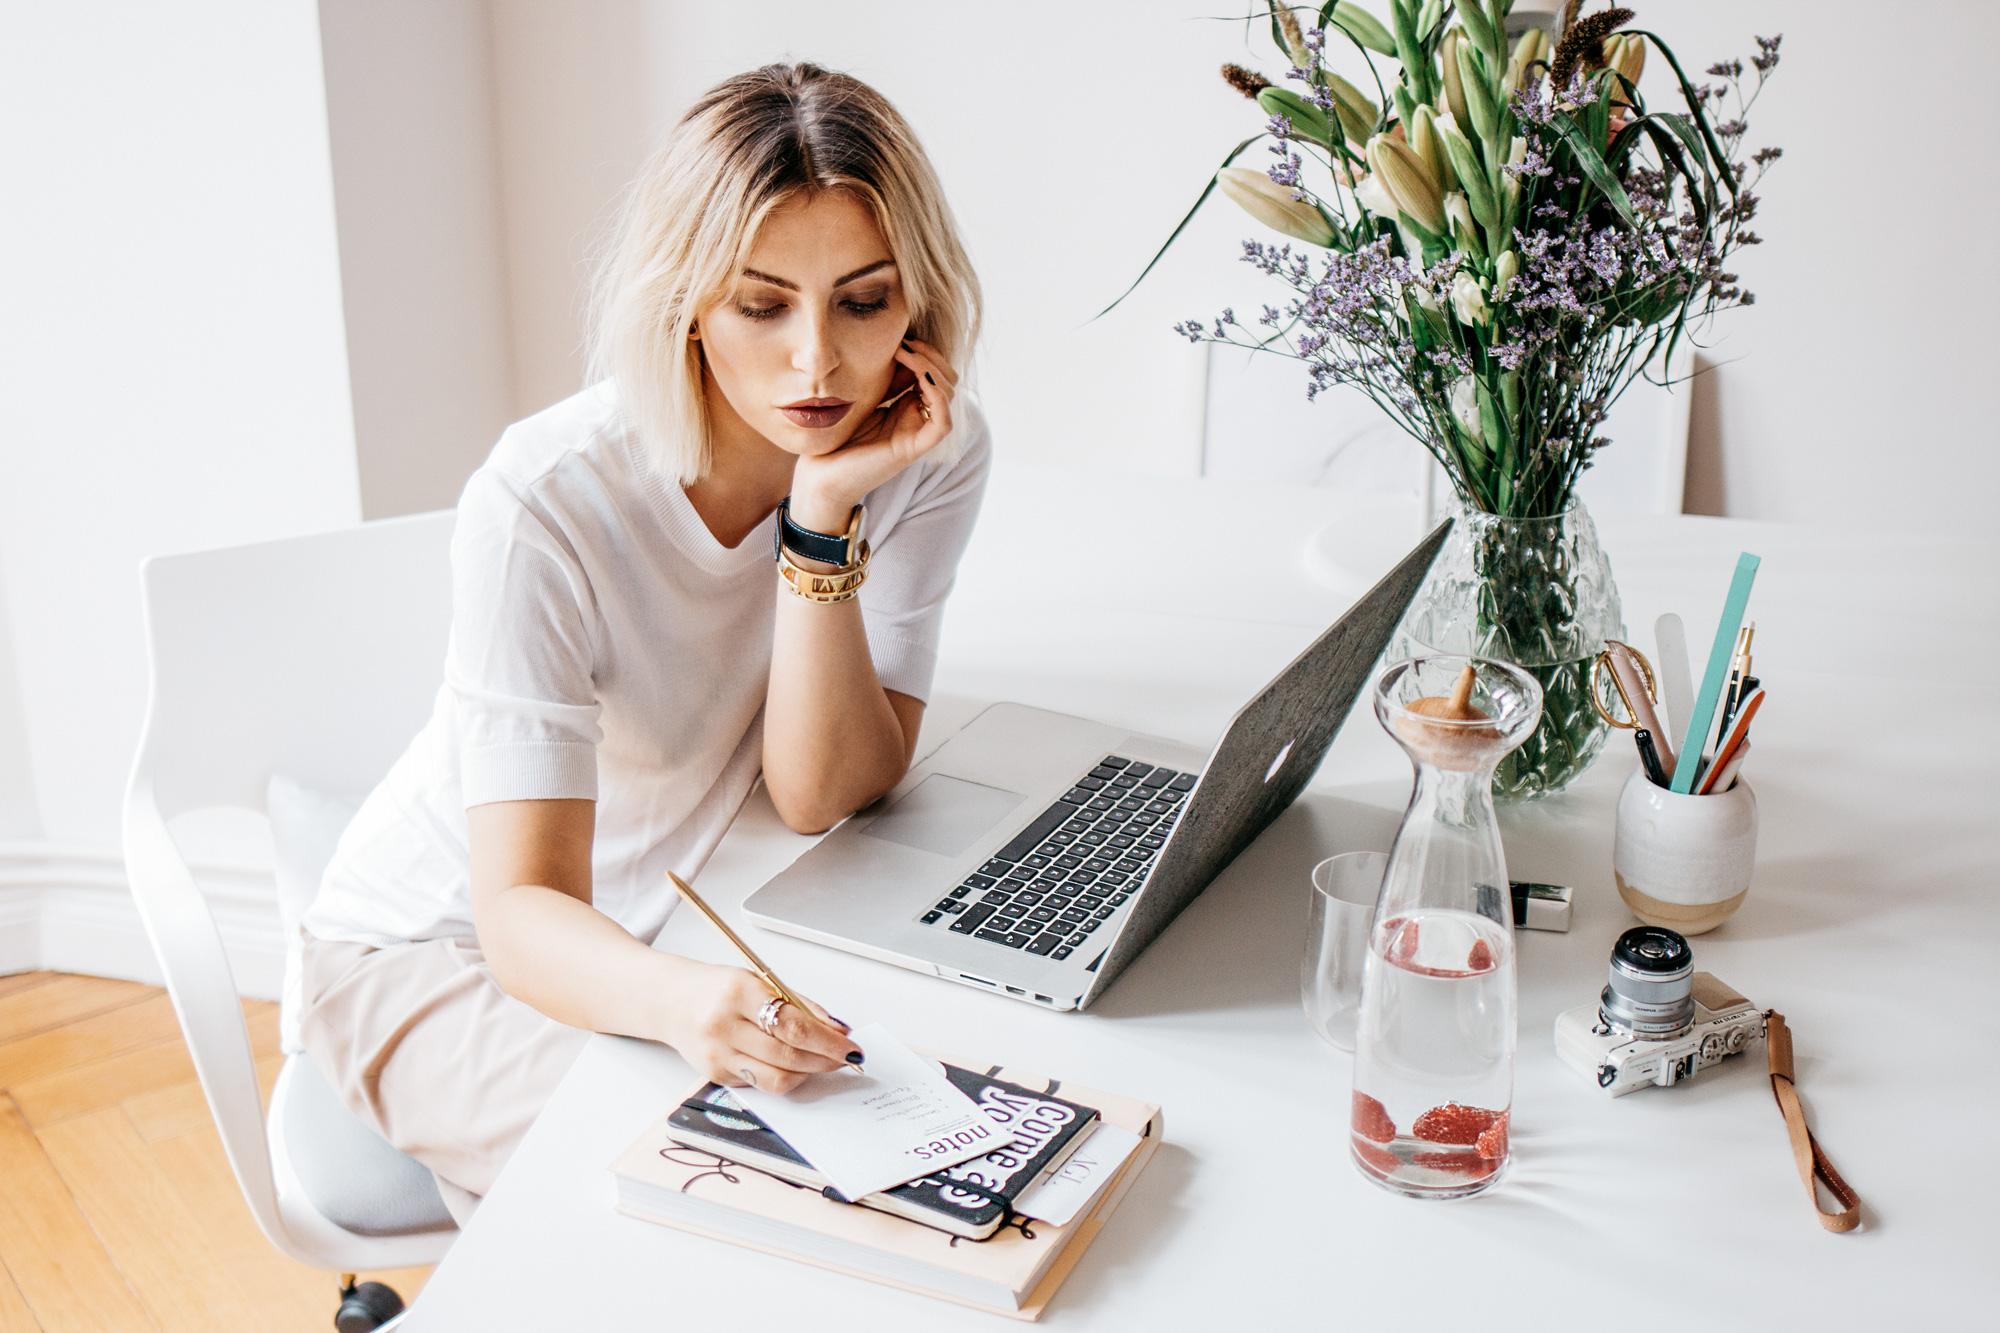 blogger-work-3